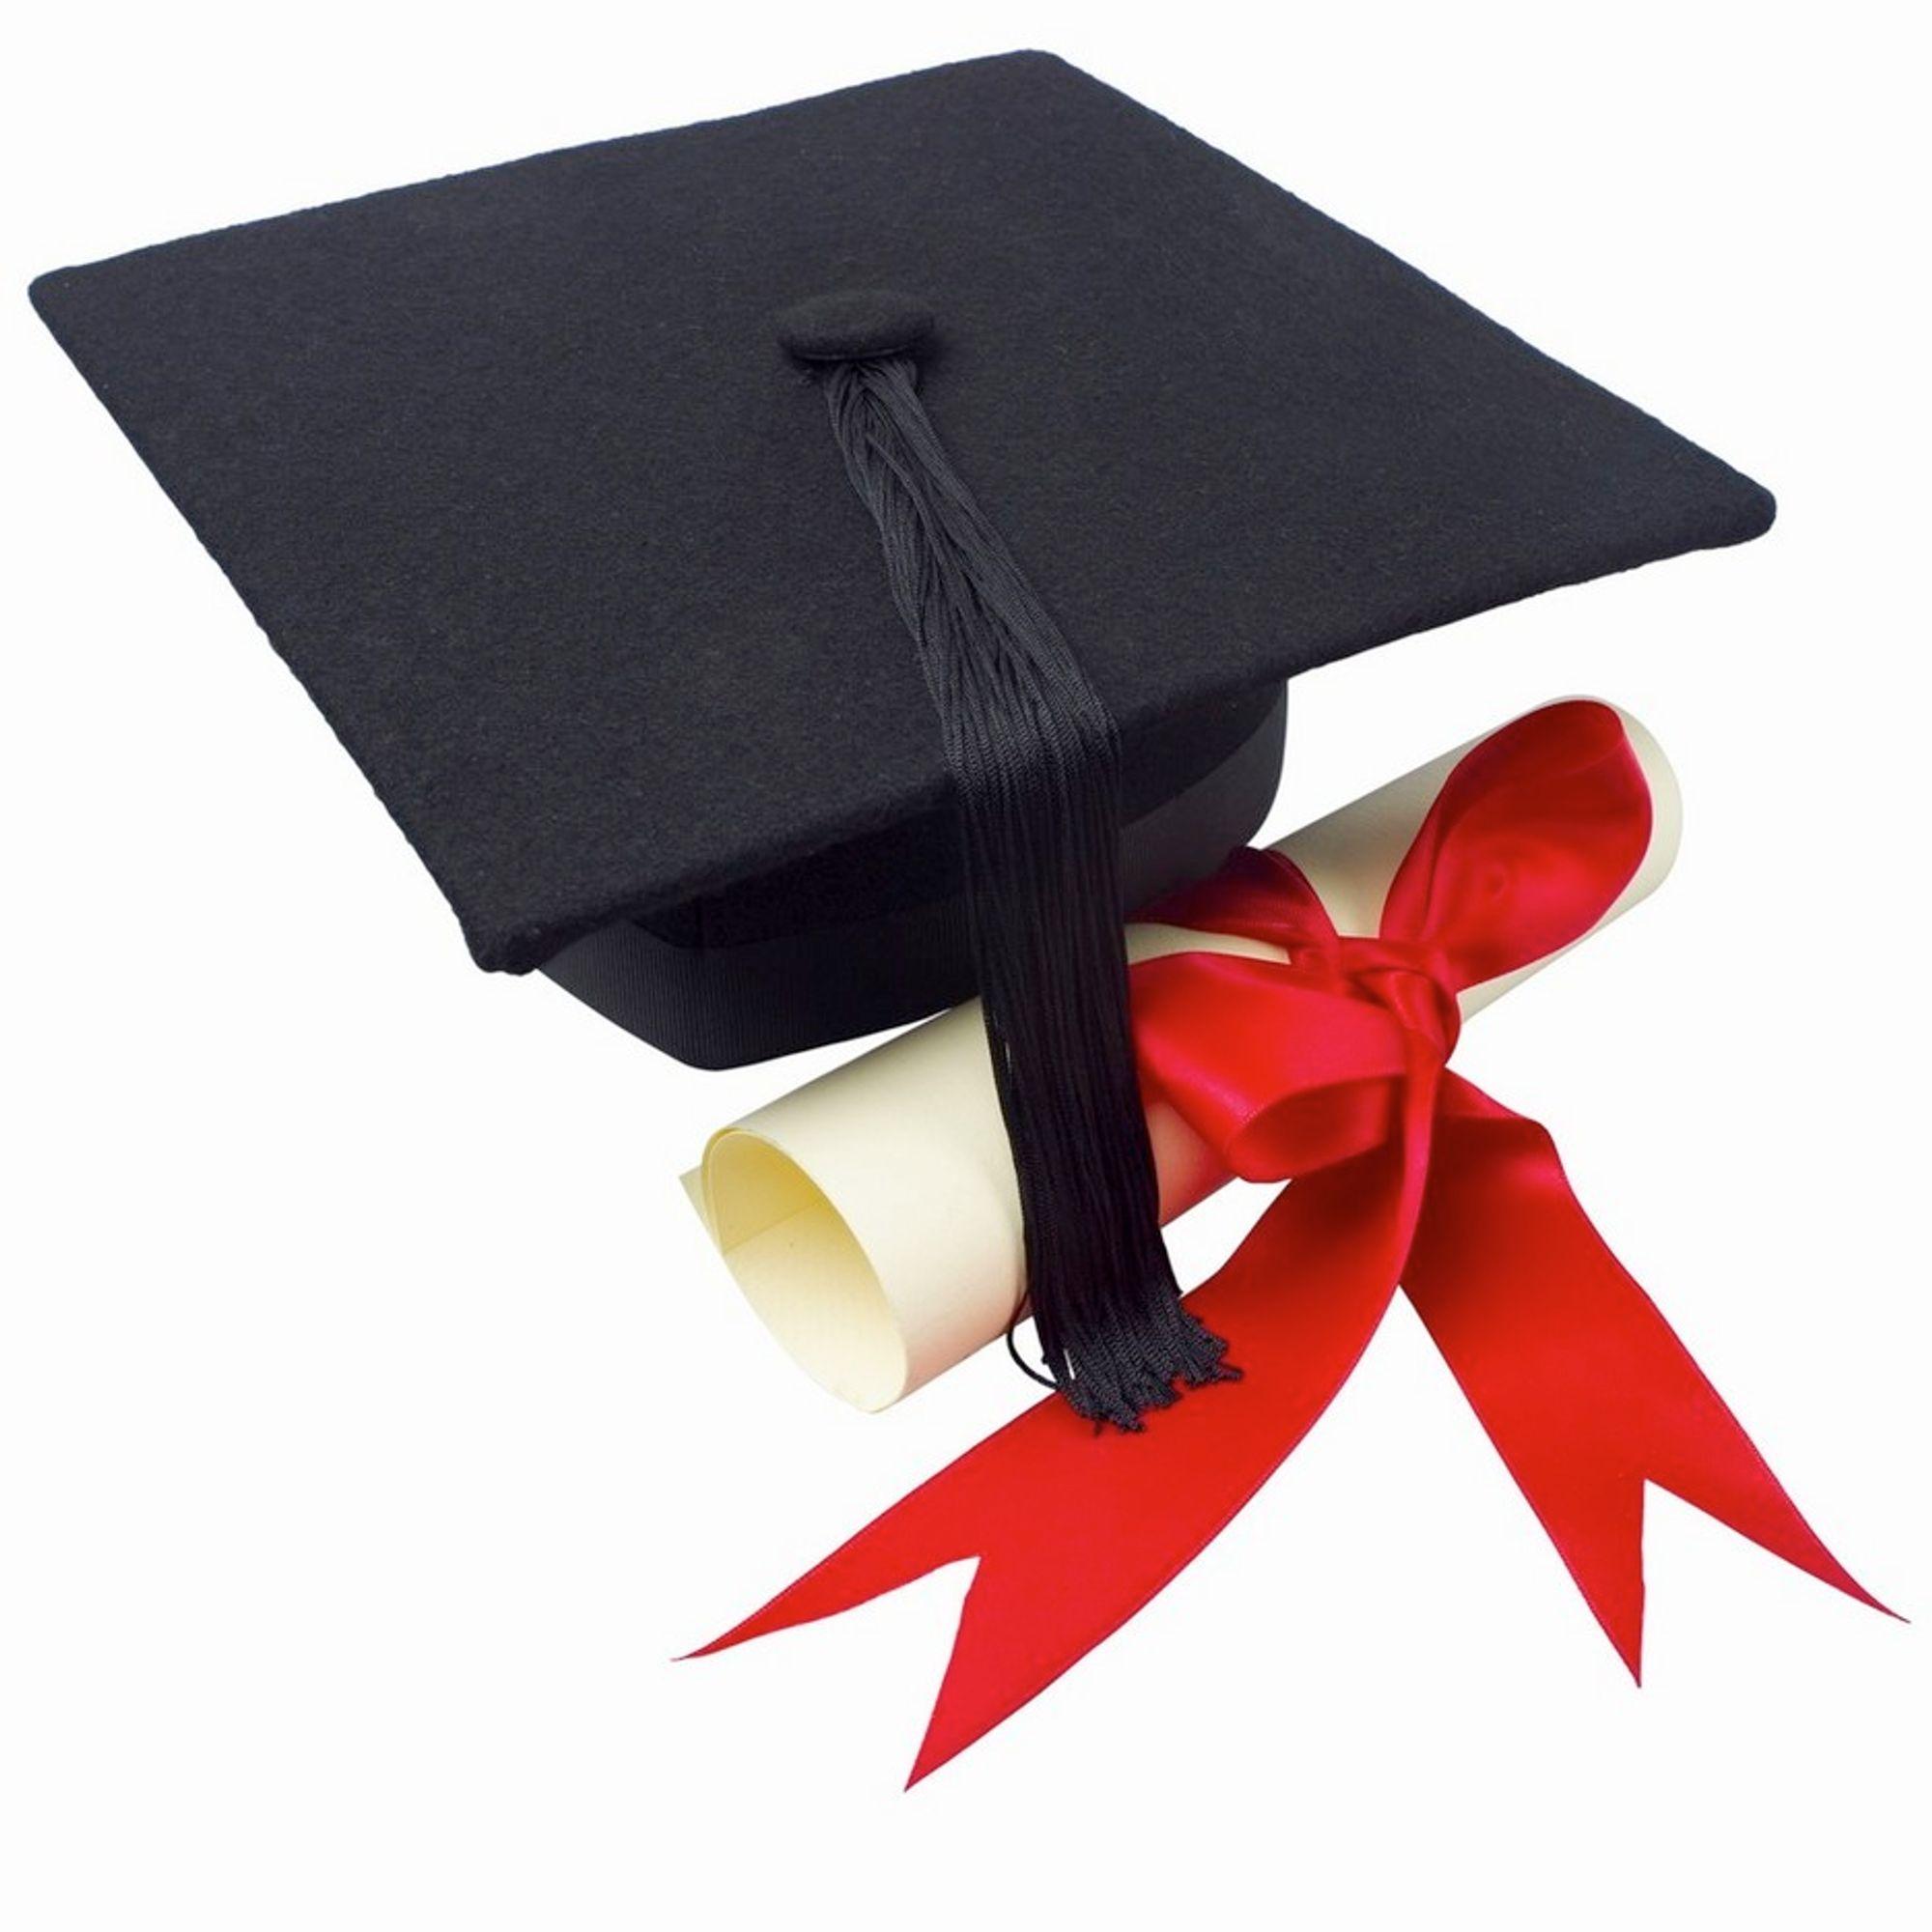 Ny rekord for doktorgrader